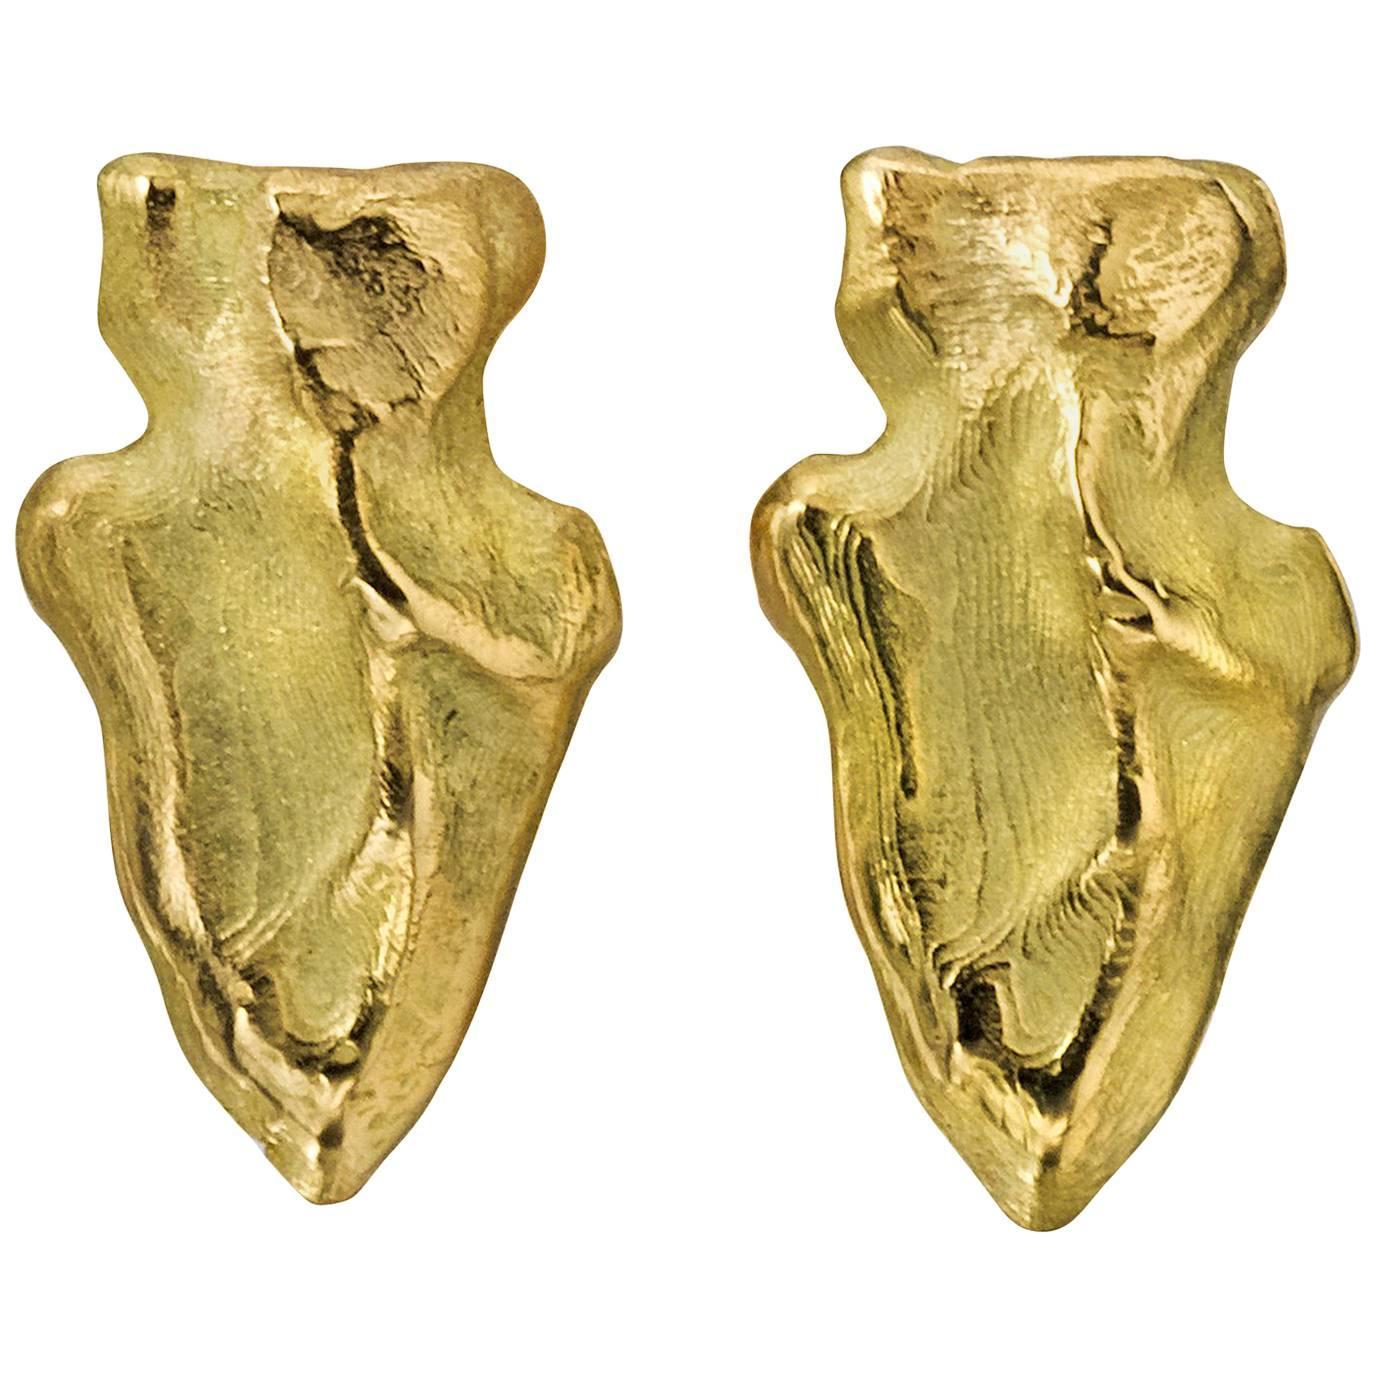 Wendy Brandes Arrowhead Gold Stud Earrings